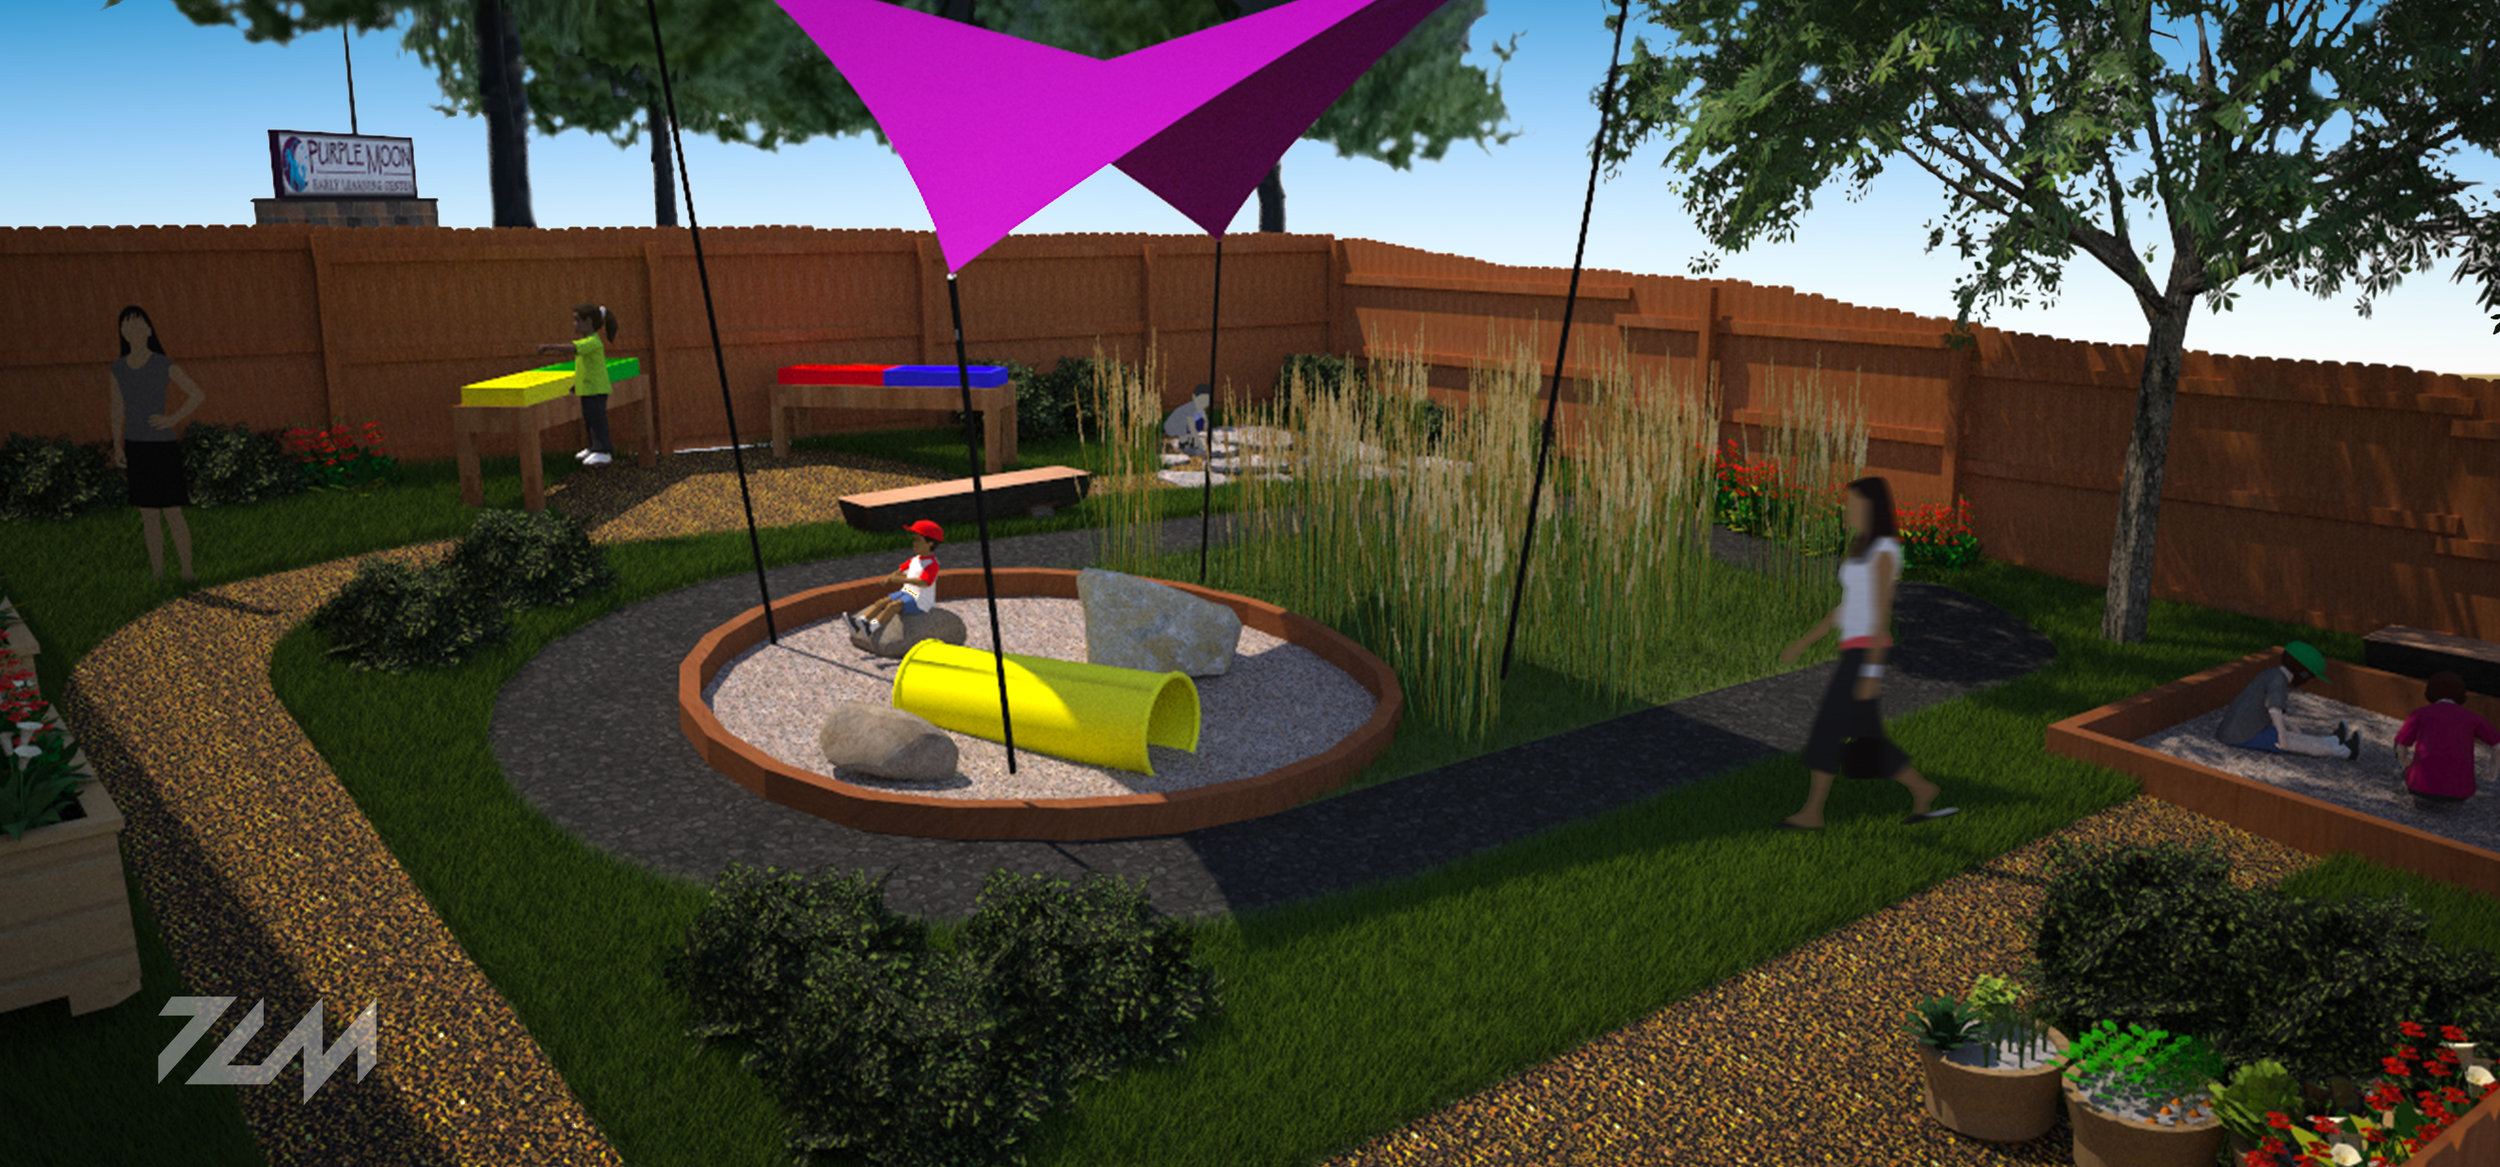 Infant/ Toddler Playground